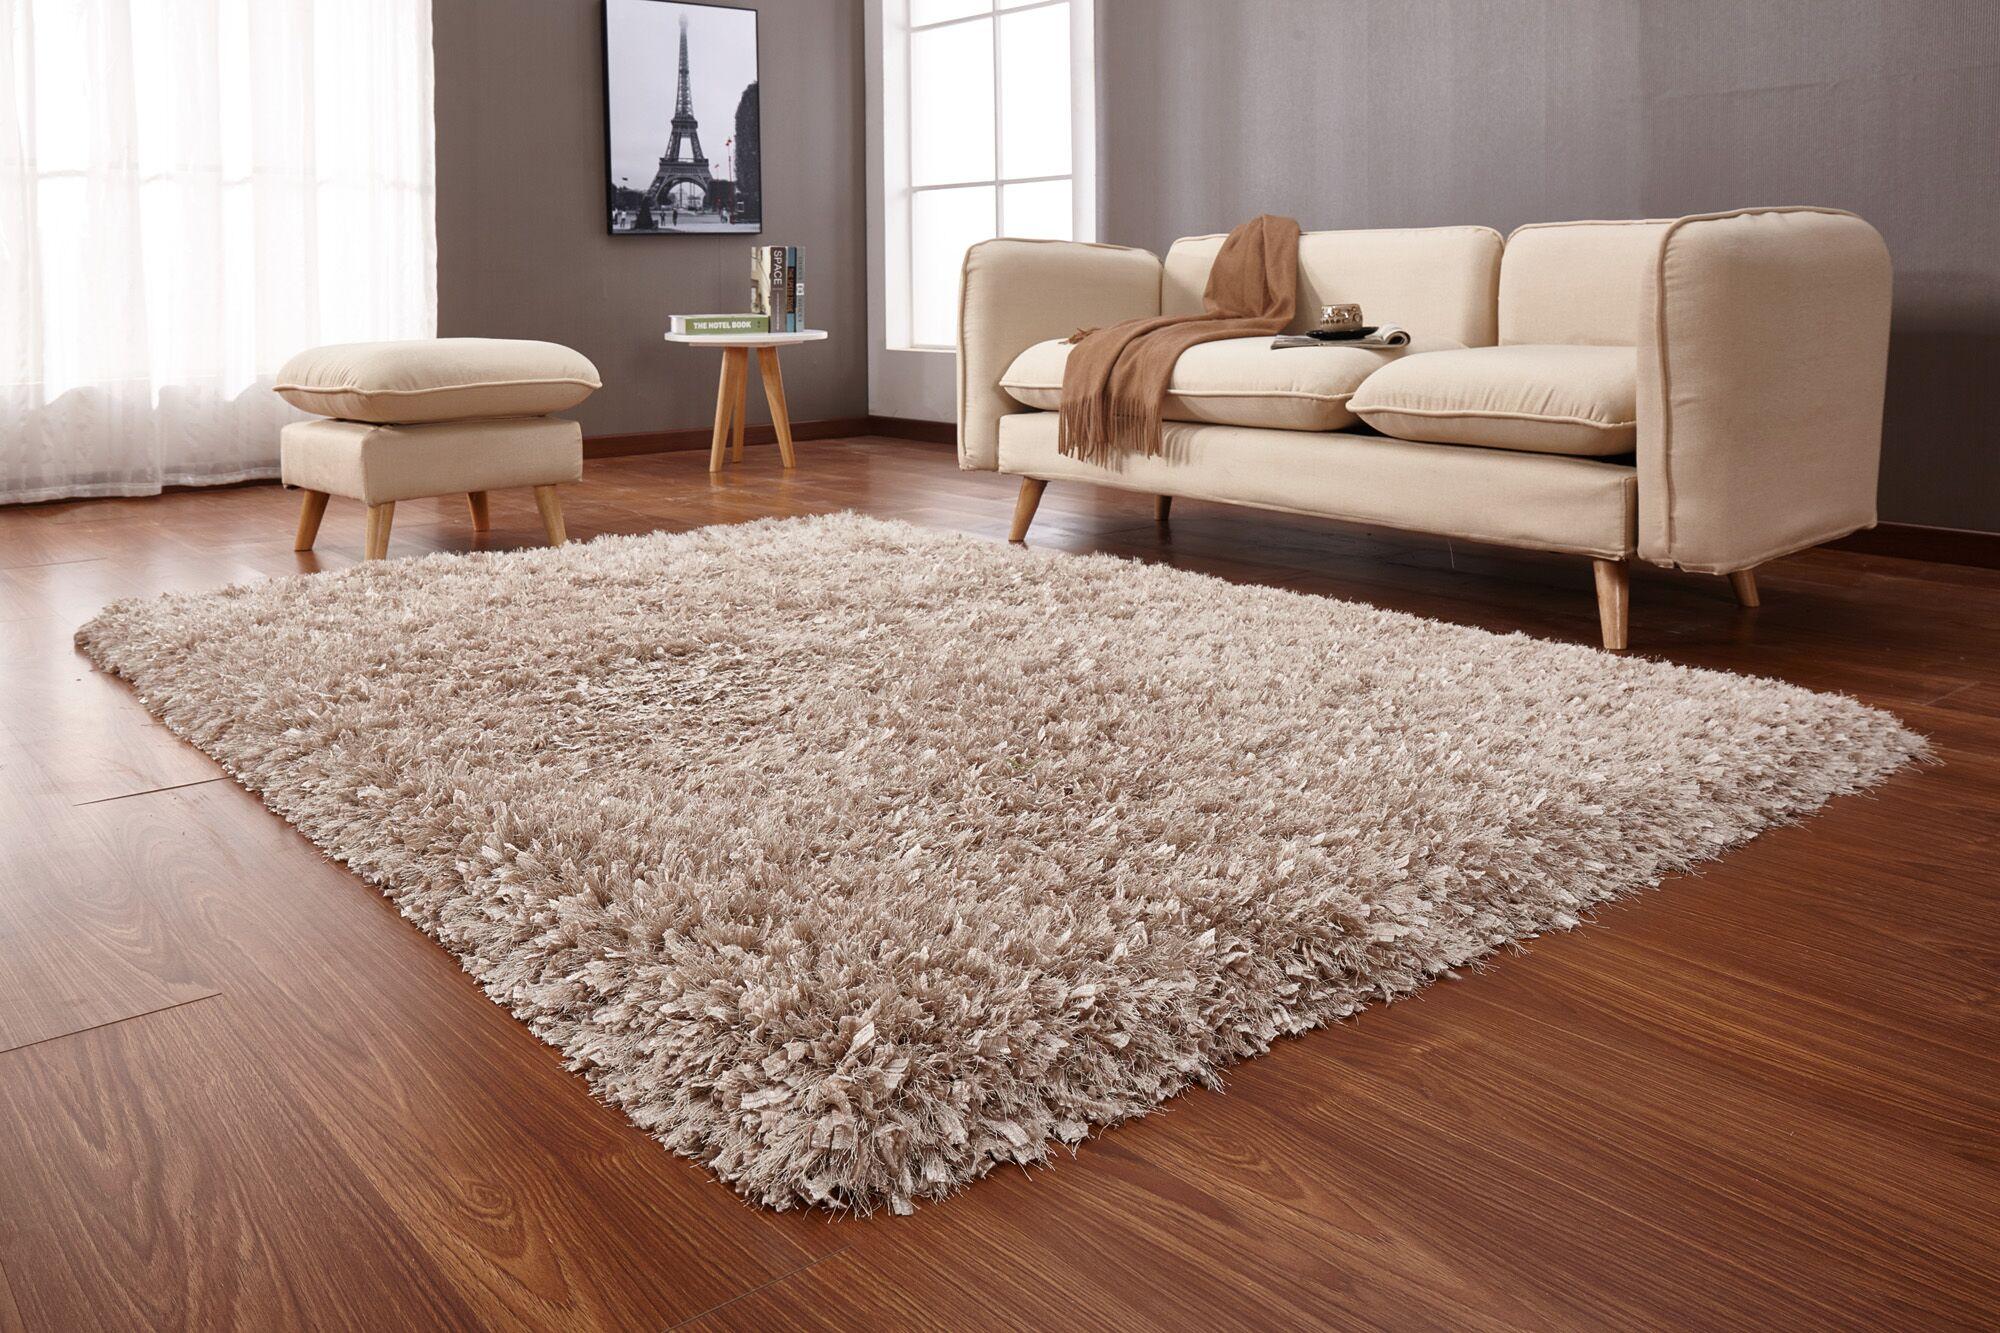 Pawlak Hand-Tufted Beige Indoor Area Rug Rug Size: Rectangle 5' x 7'